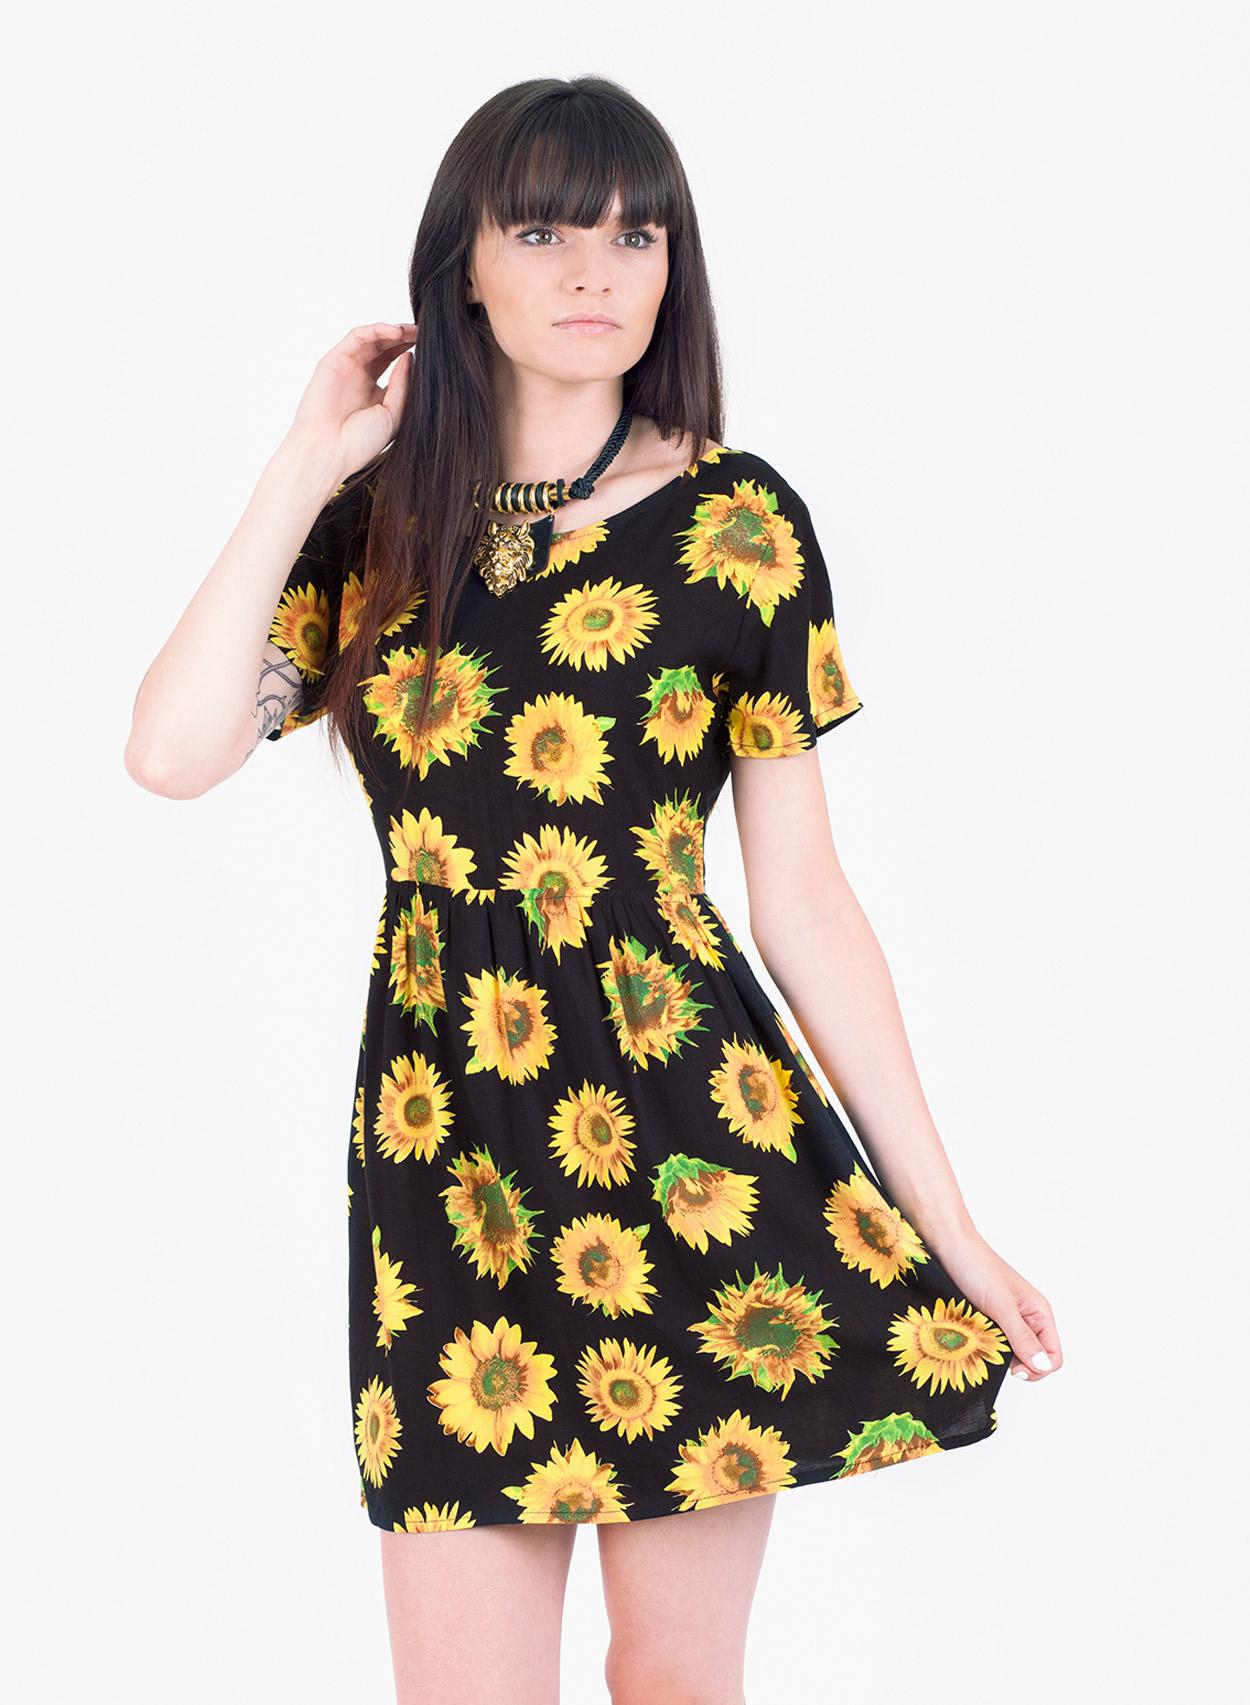 Sunflower Dress Picture Collection Dressedupgirl Com